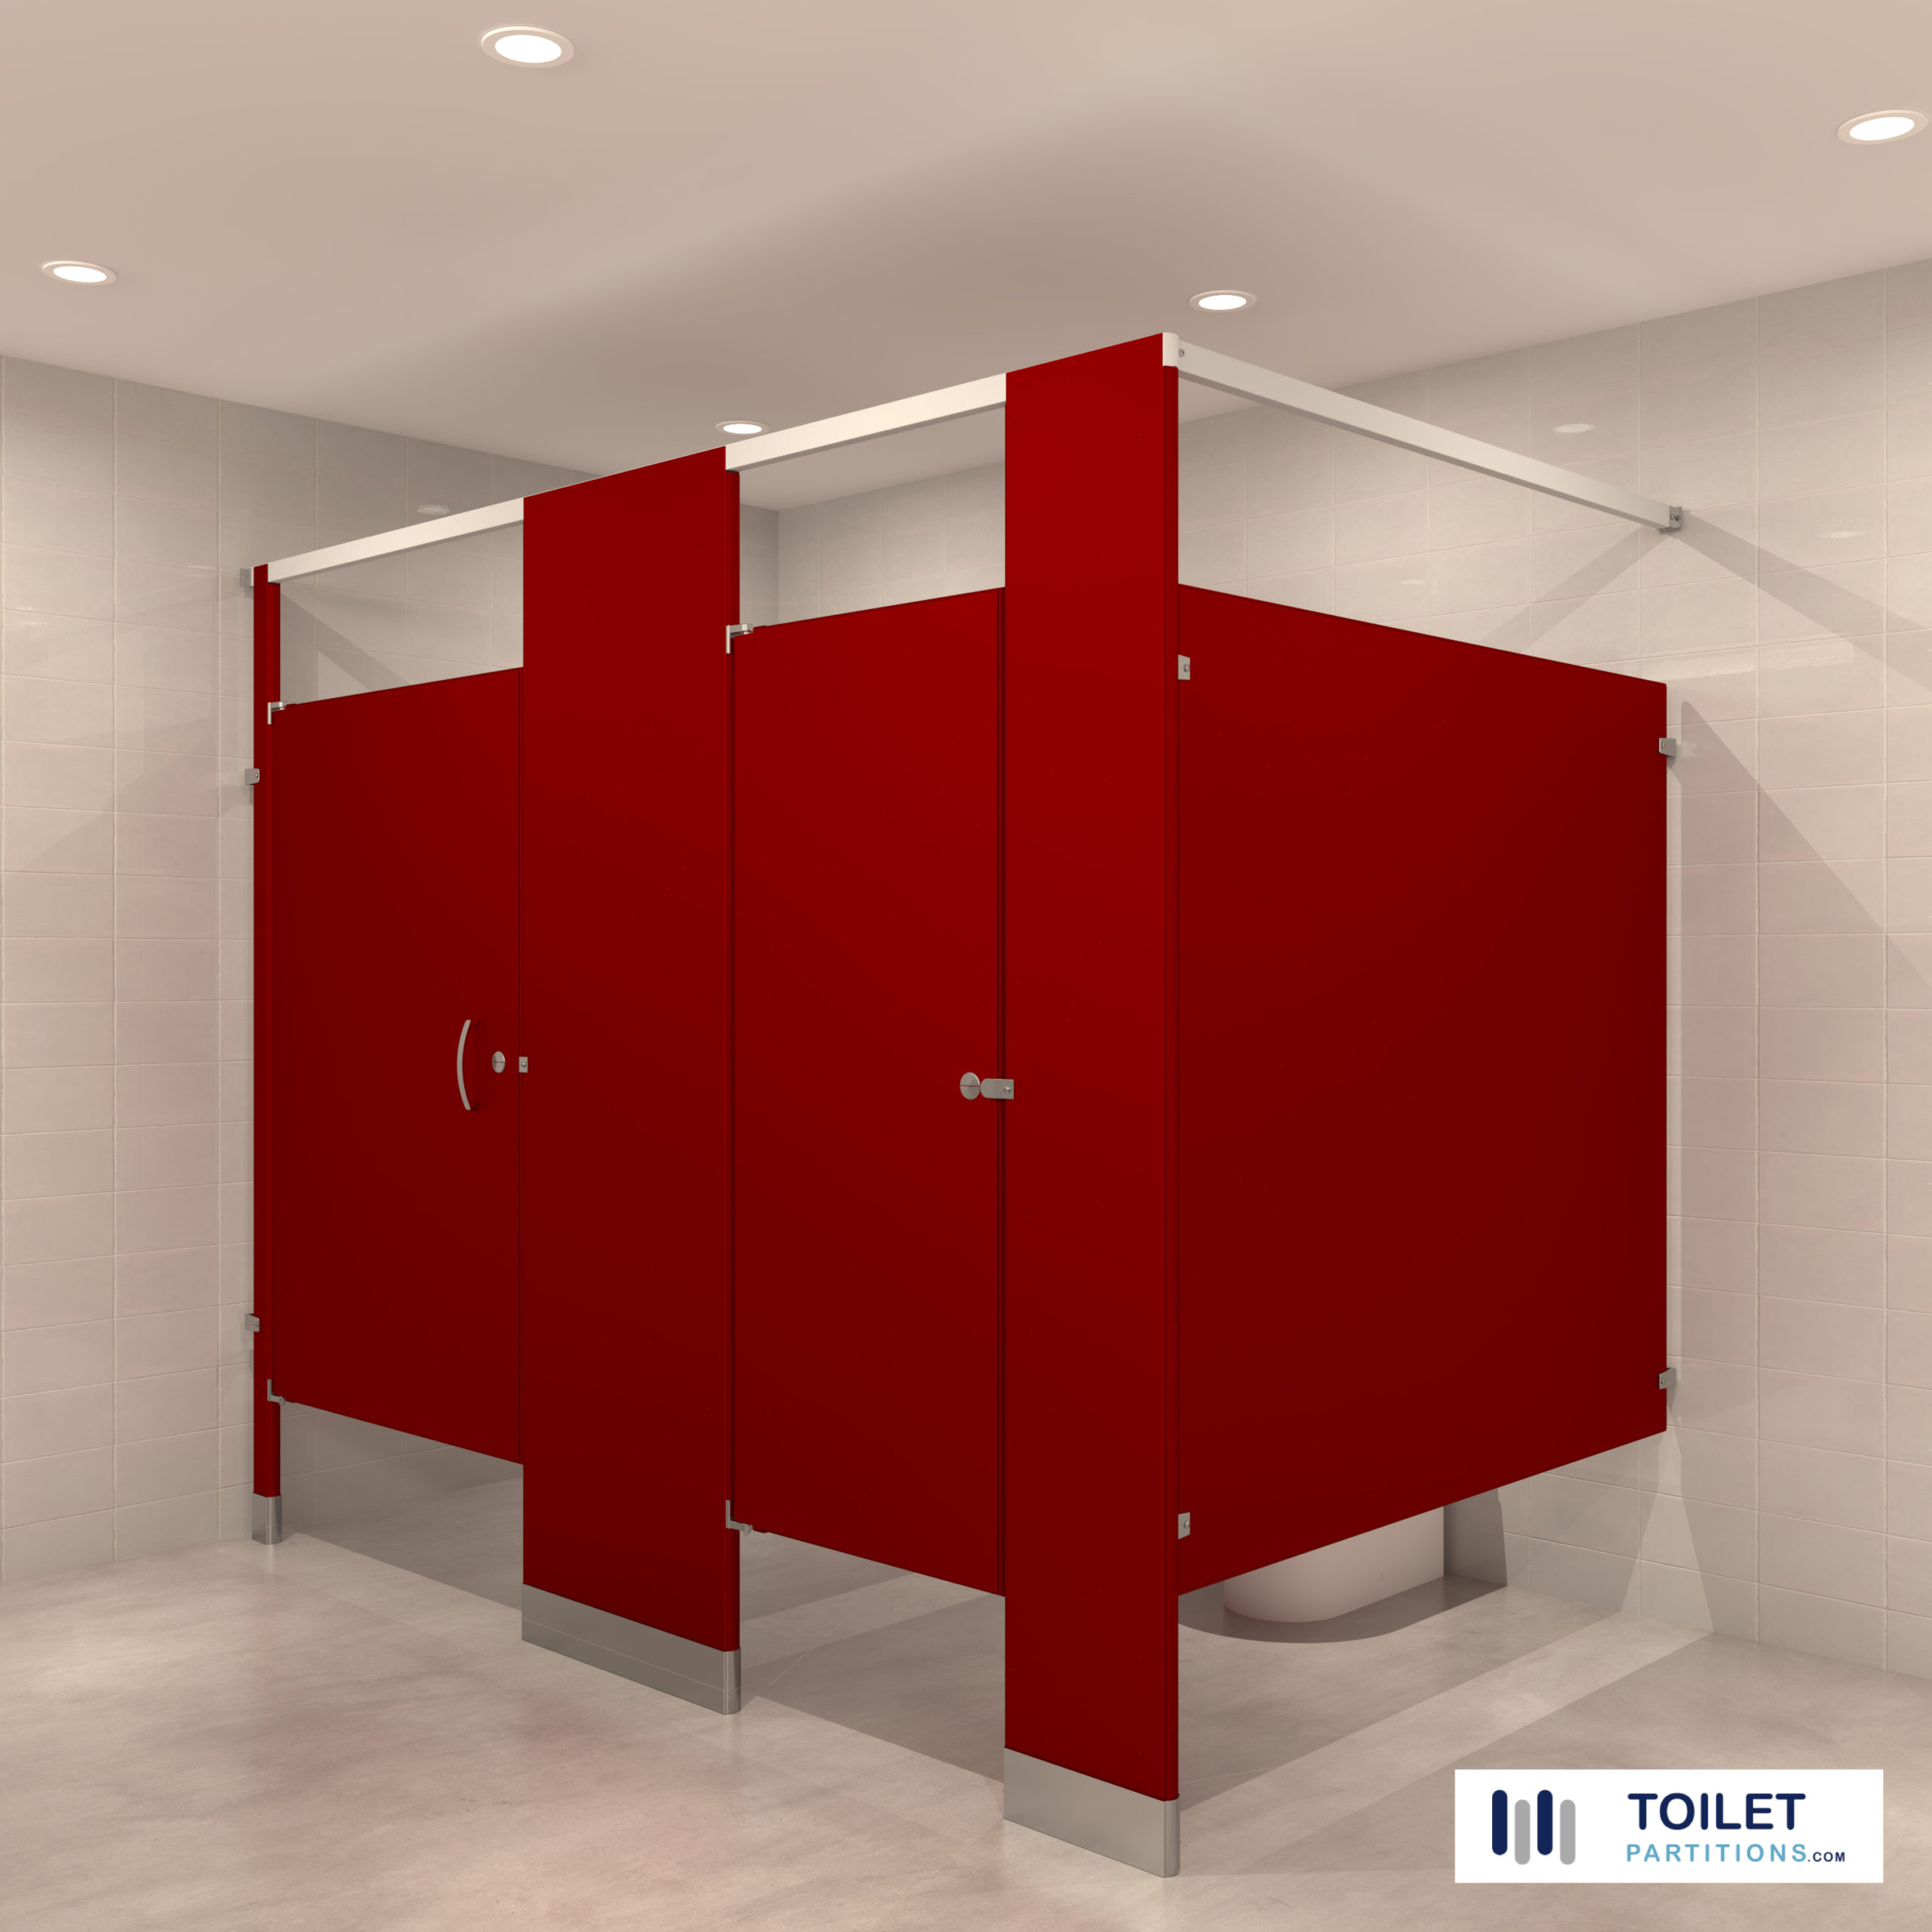 Quality Bathroom Stalls Expert Ada Help Fast Easy